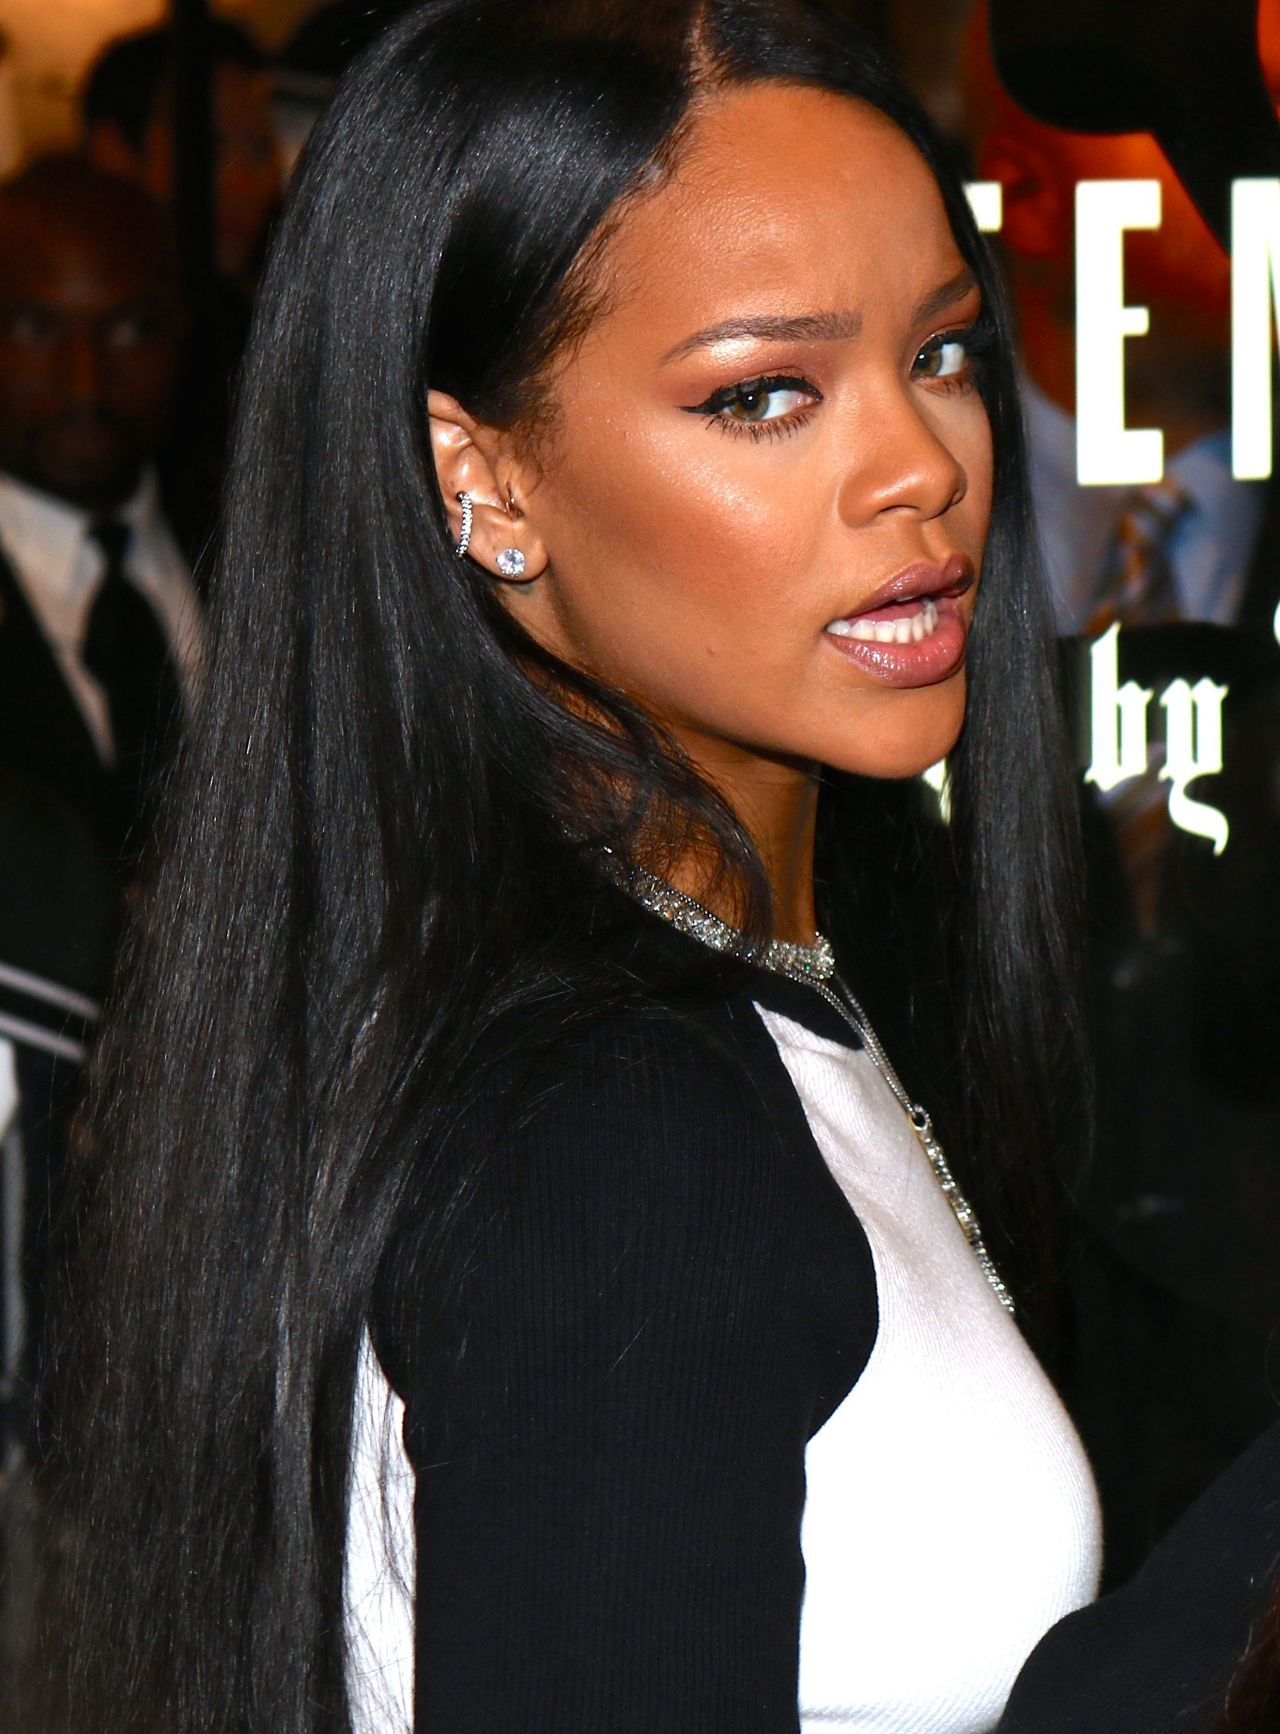 Rihanna - Arrives For FENTY PUMA x RIHANNA Debut in NYC 9 ...